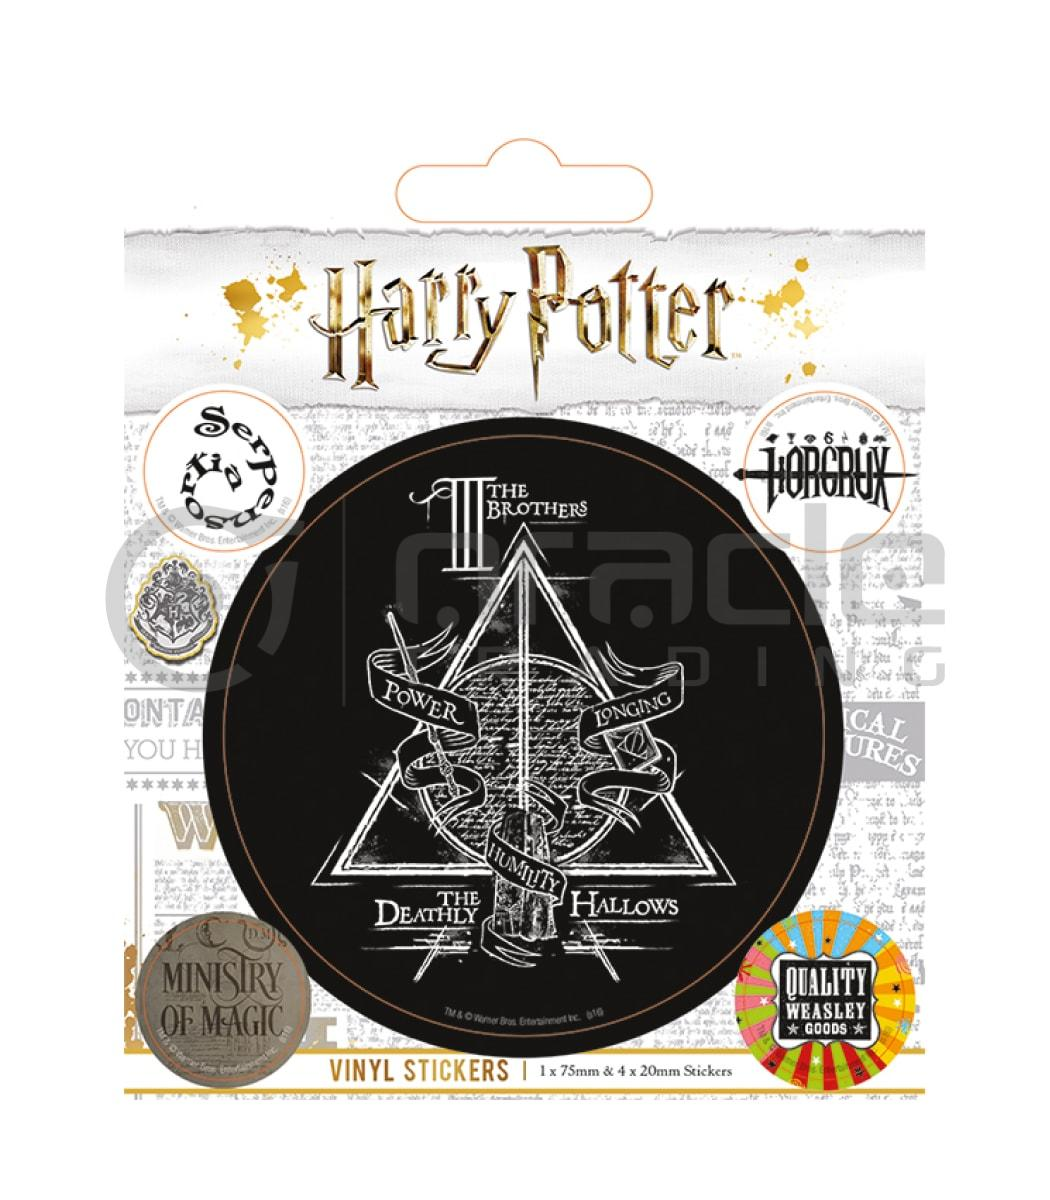 Harry Potter Vinyl Sticker Pack - Hallows